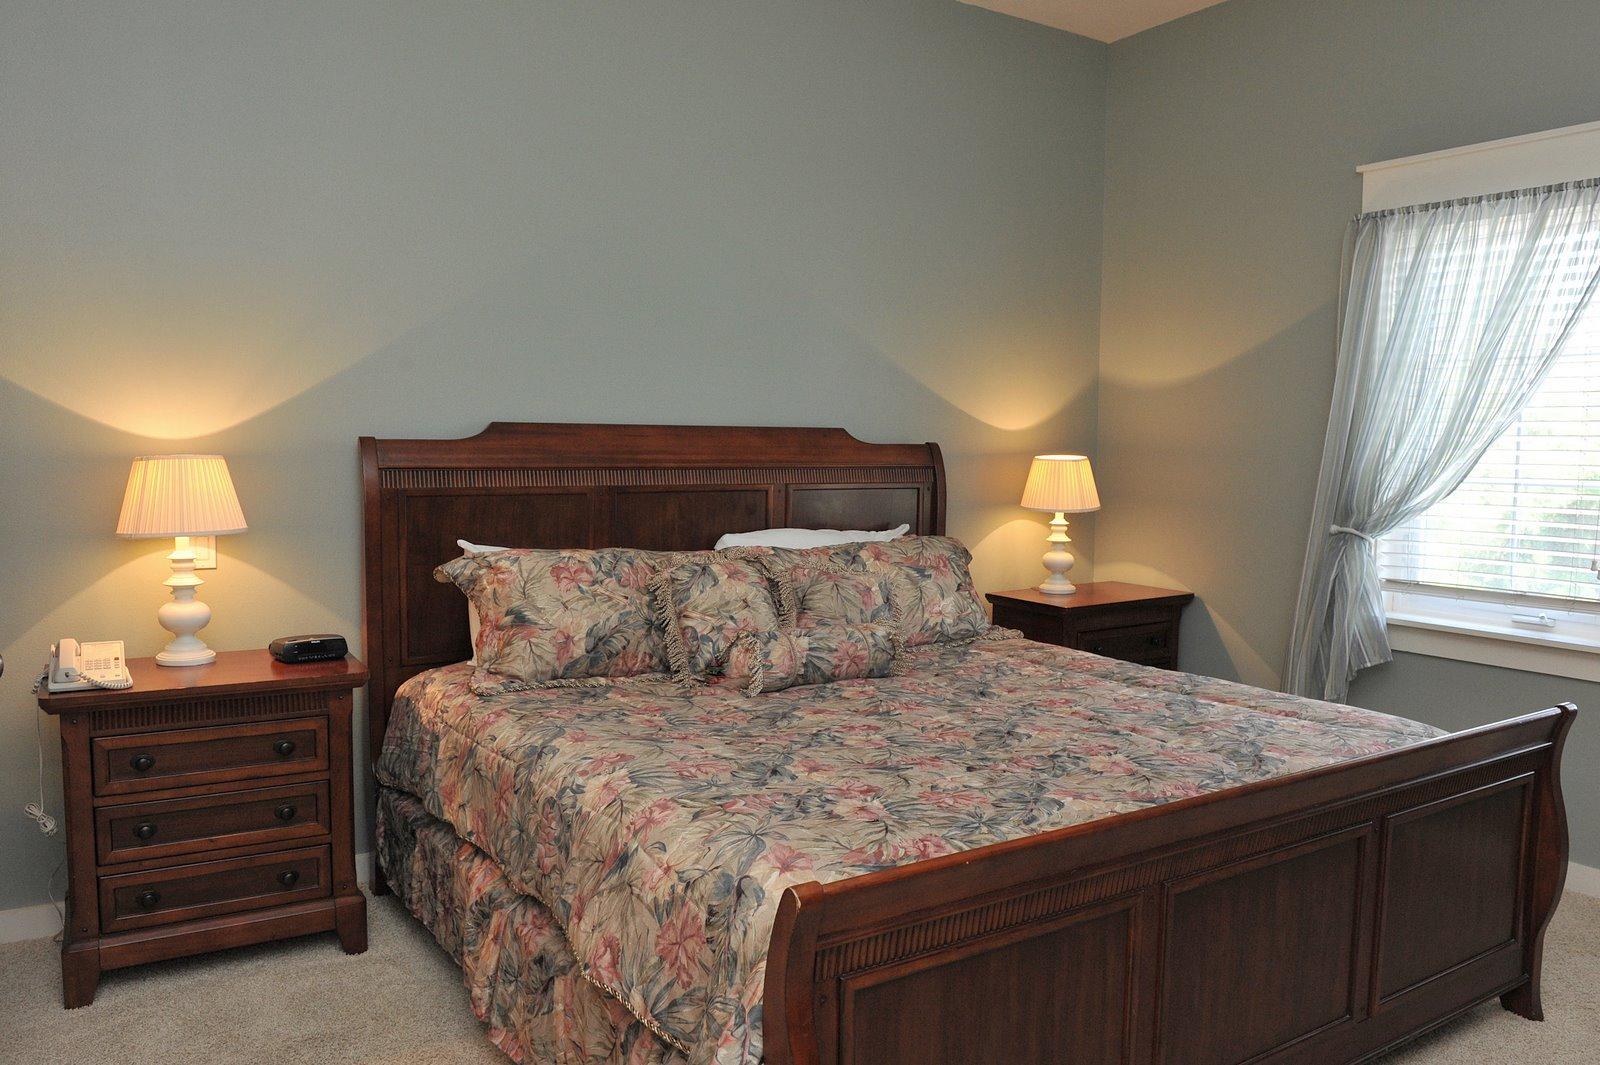 1280 Laurel Grove Condo rental in Sandestin Rentals ~ Cottages and Villas  in Destin Florida - #12